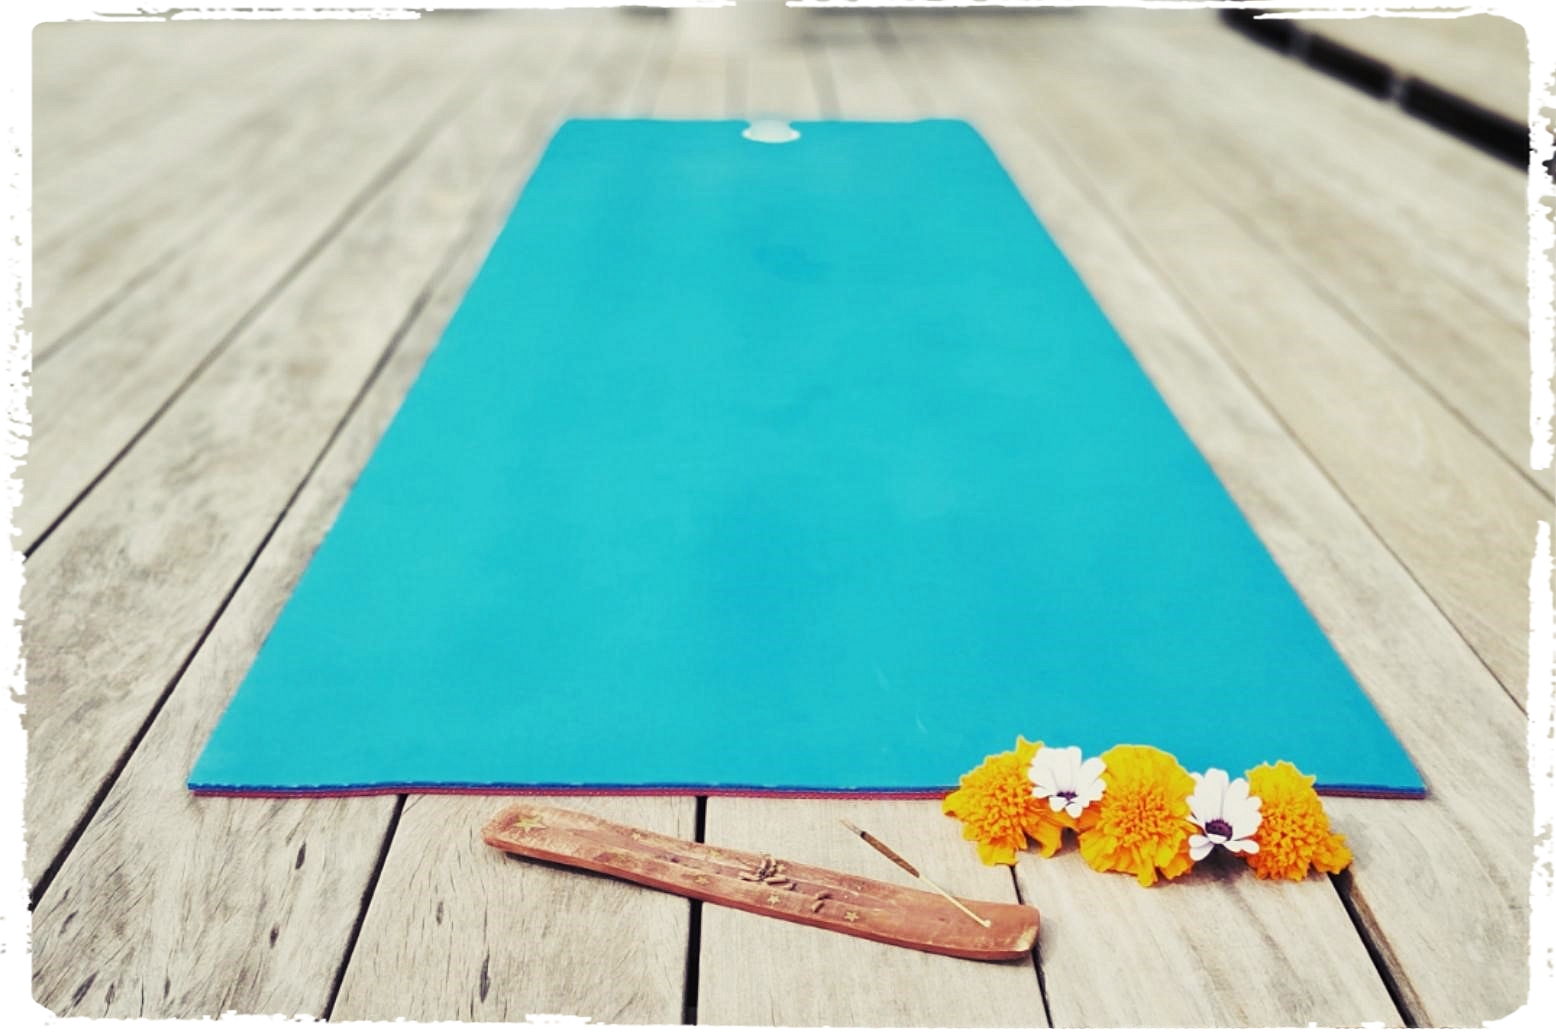 Yogastunden im Sommer